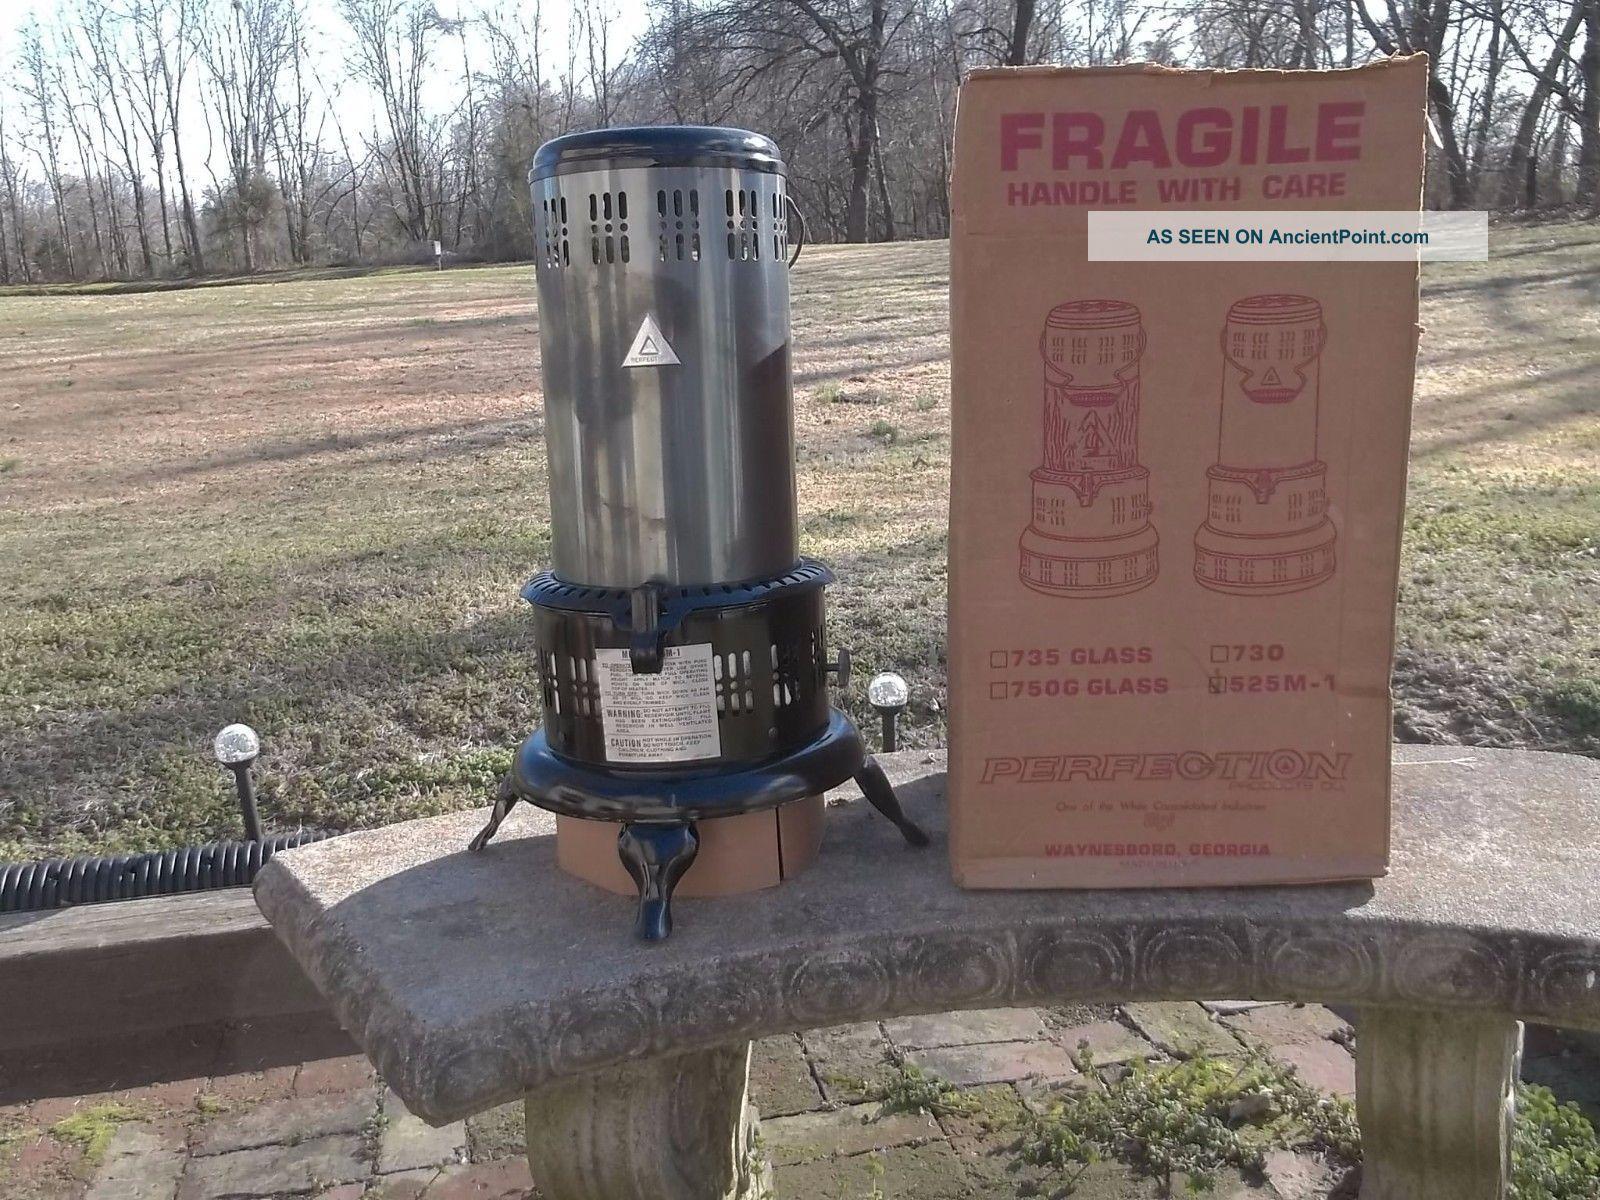 Rare Nos Un - Perfection Kerosene Oil Heater Stove 24